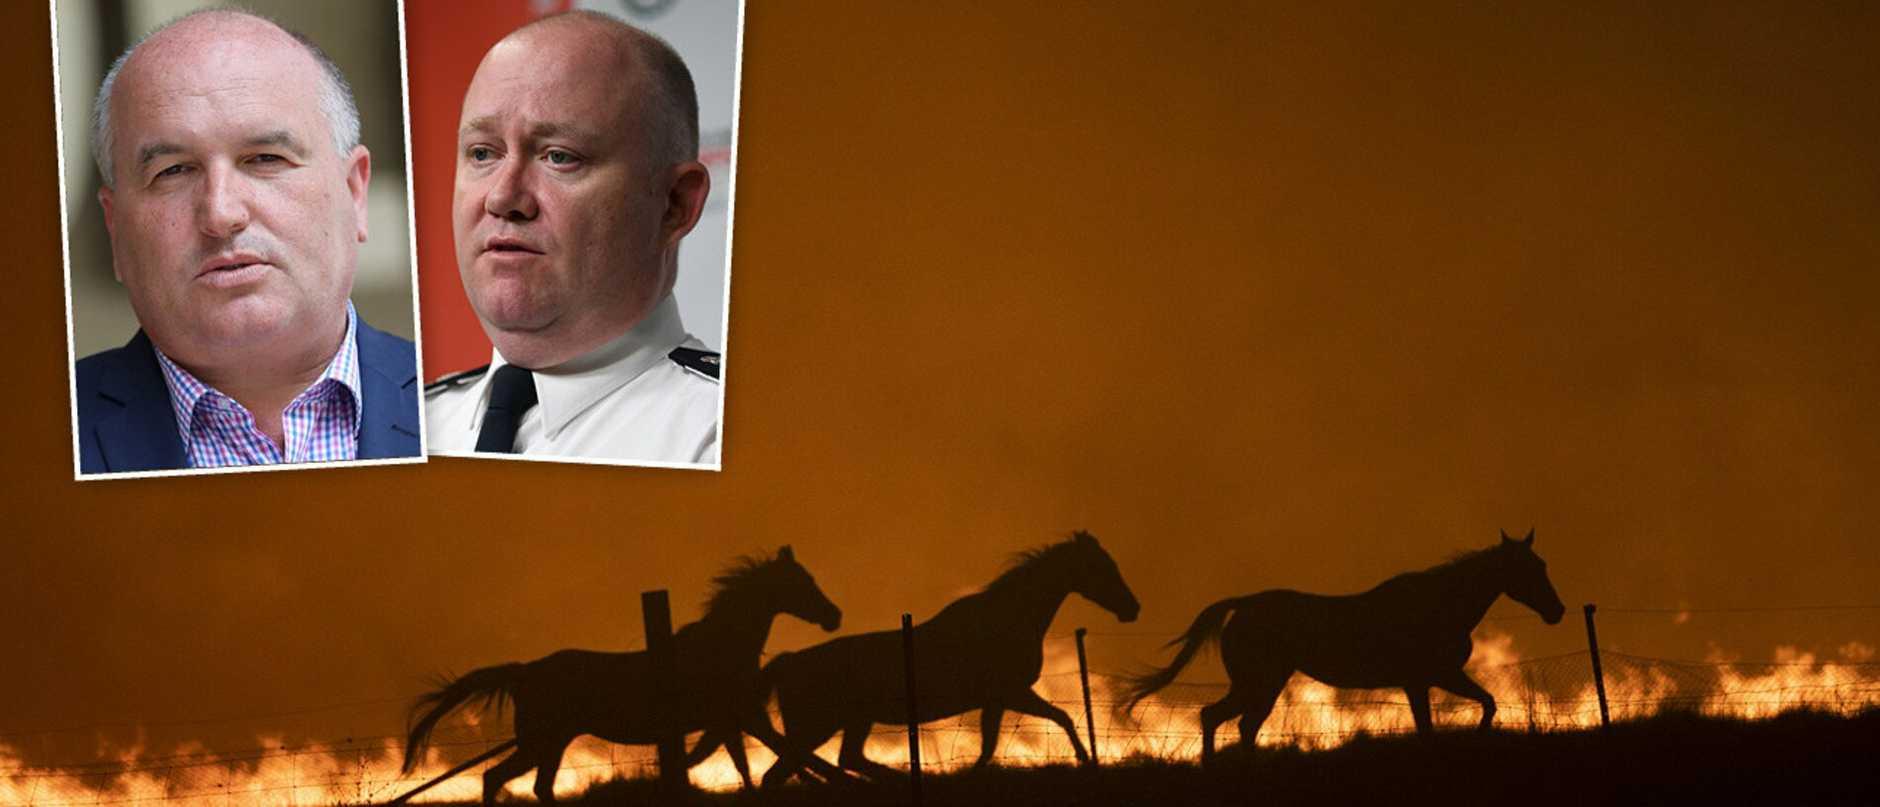 NSW bushfire season set to be extended - wide